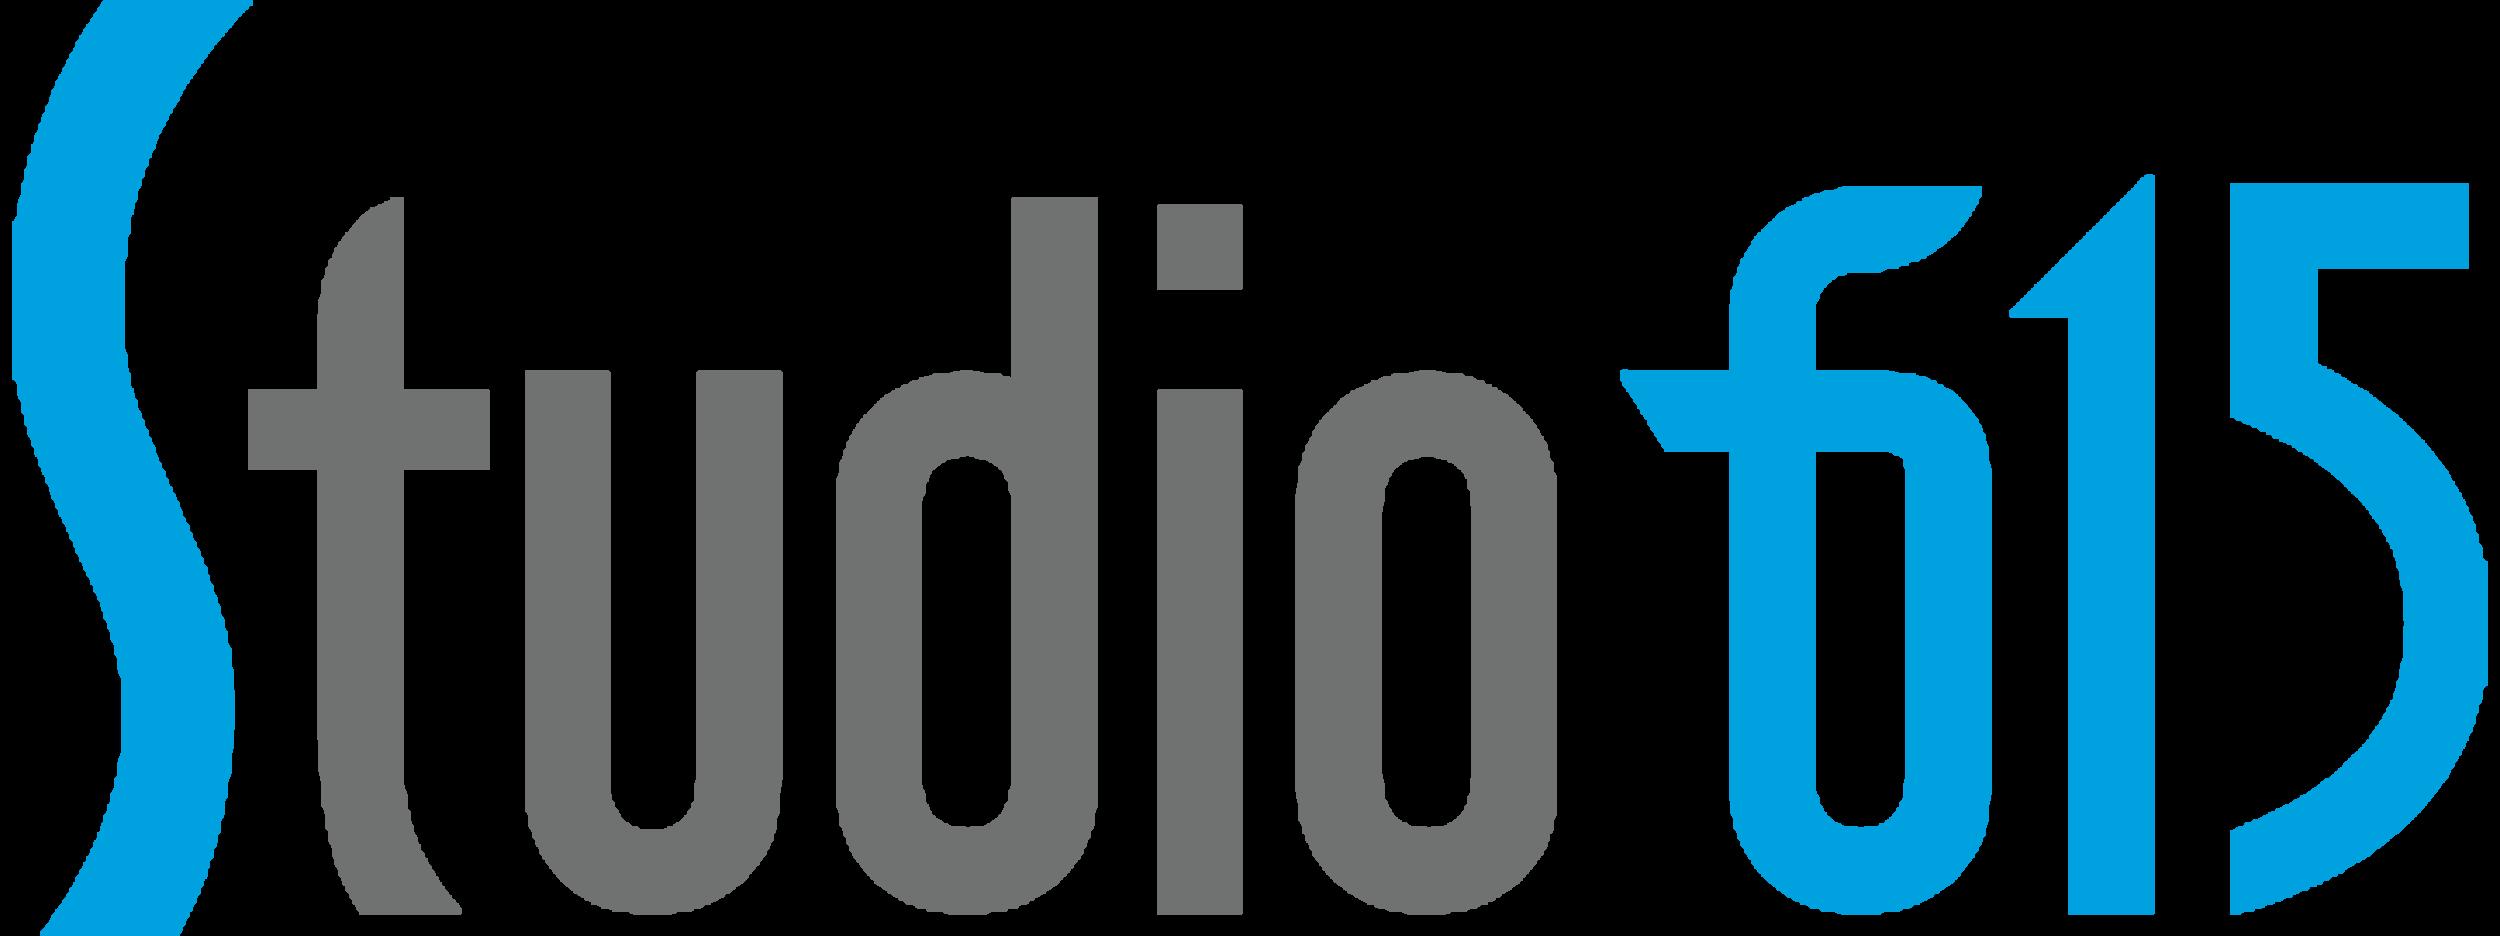 logo-grid-studio-color.png